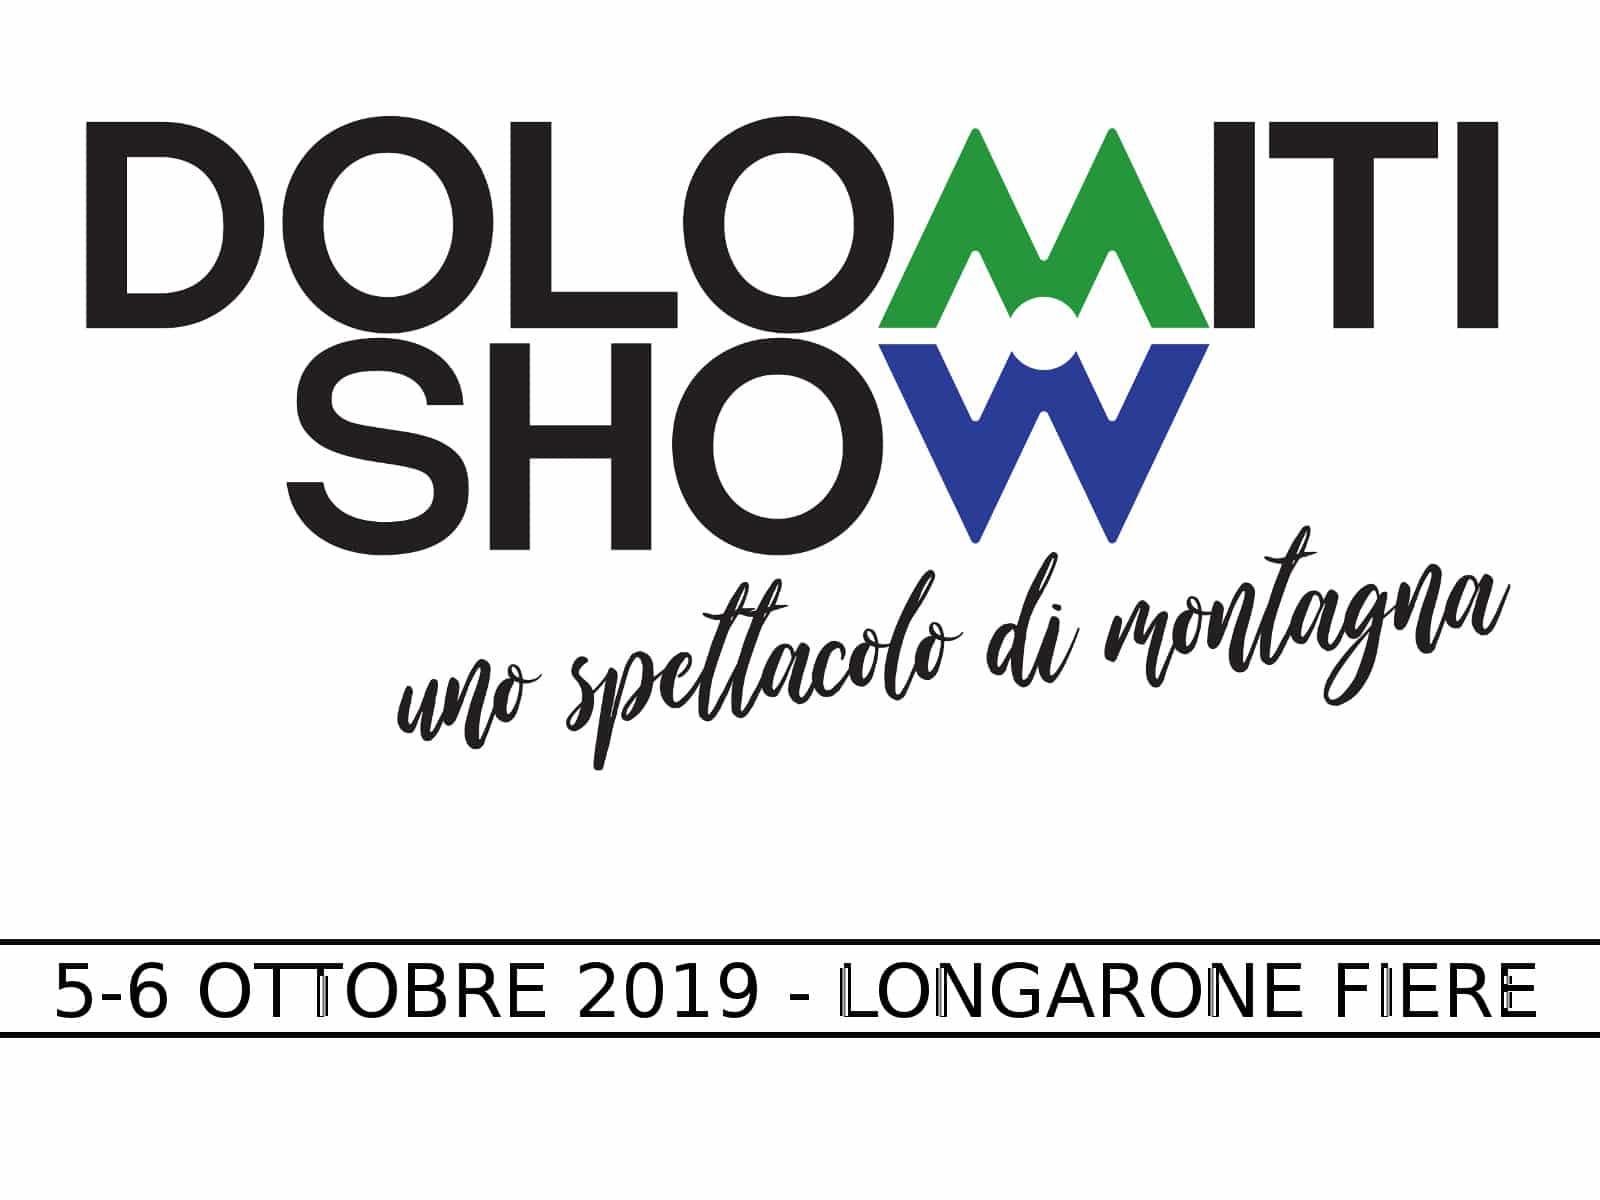 Dolomiti Show LOGO